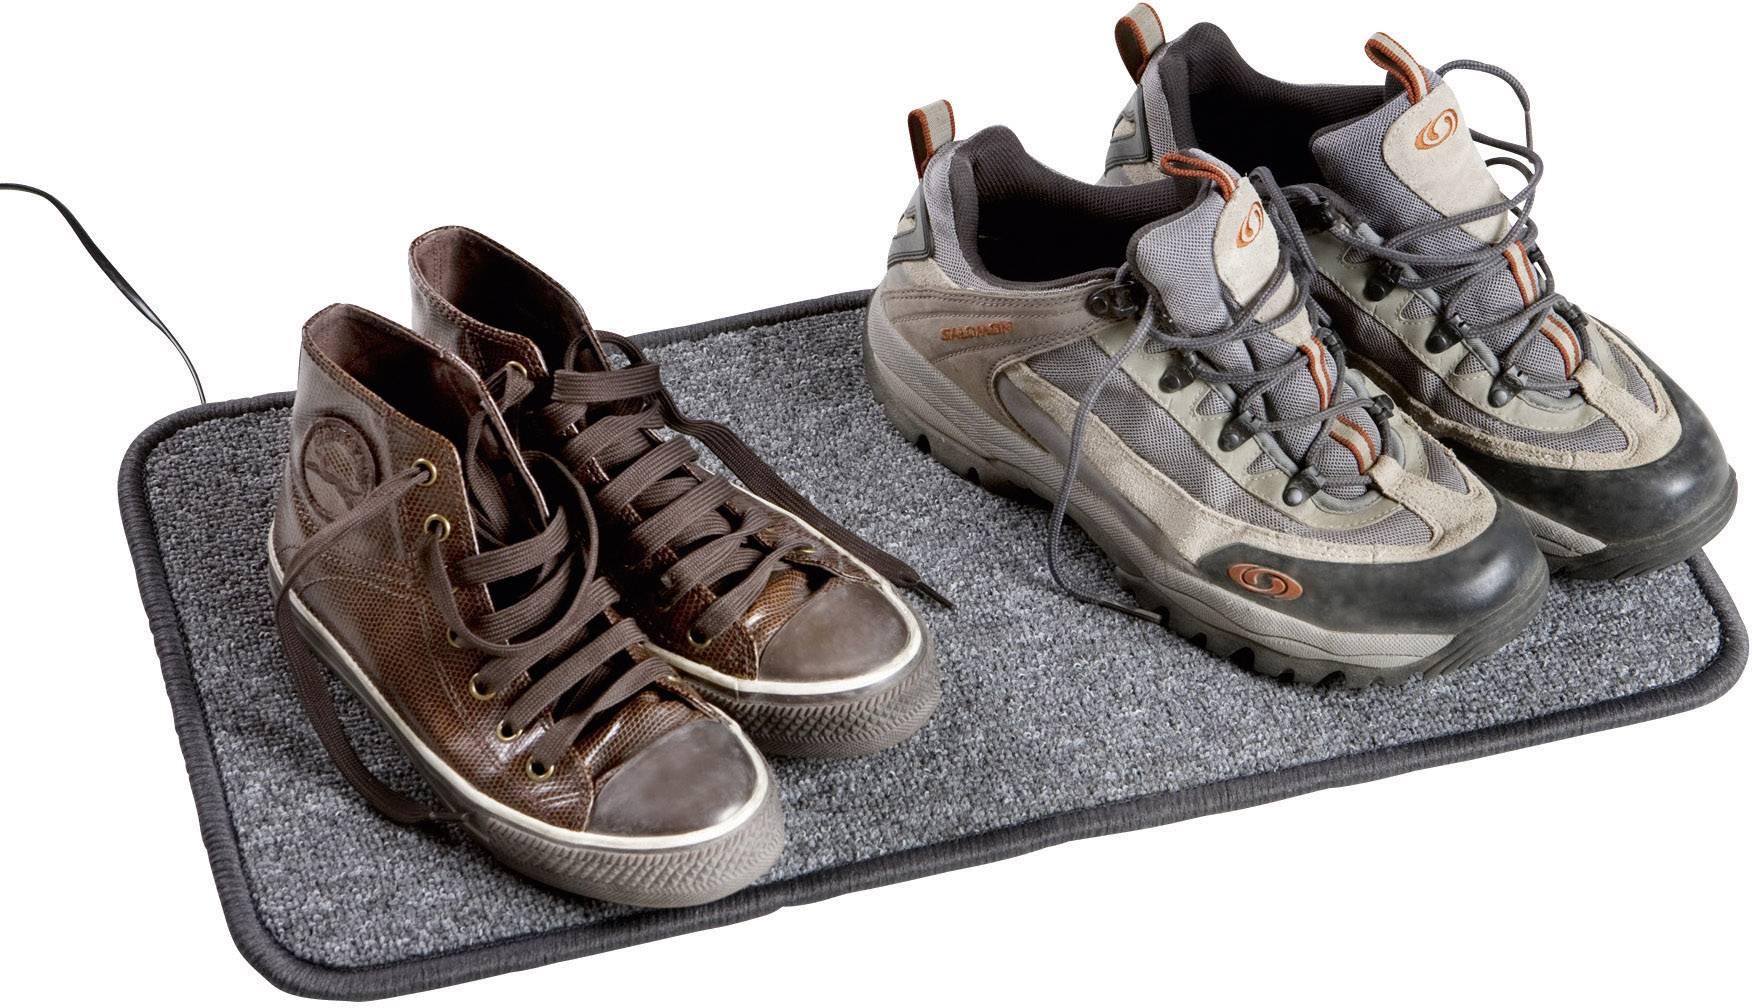 Sušička topánok Arnold Rak FH21018 611255, (d x š x v) 60 x 30 x 1.5 cm, antracitová